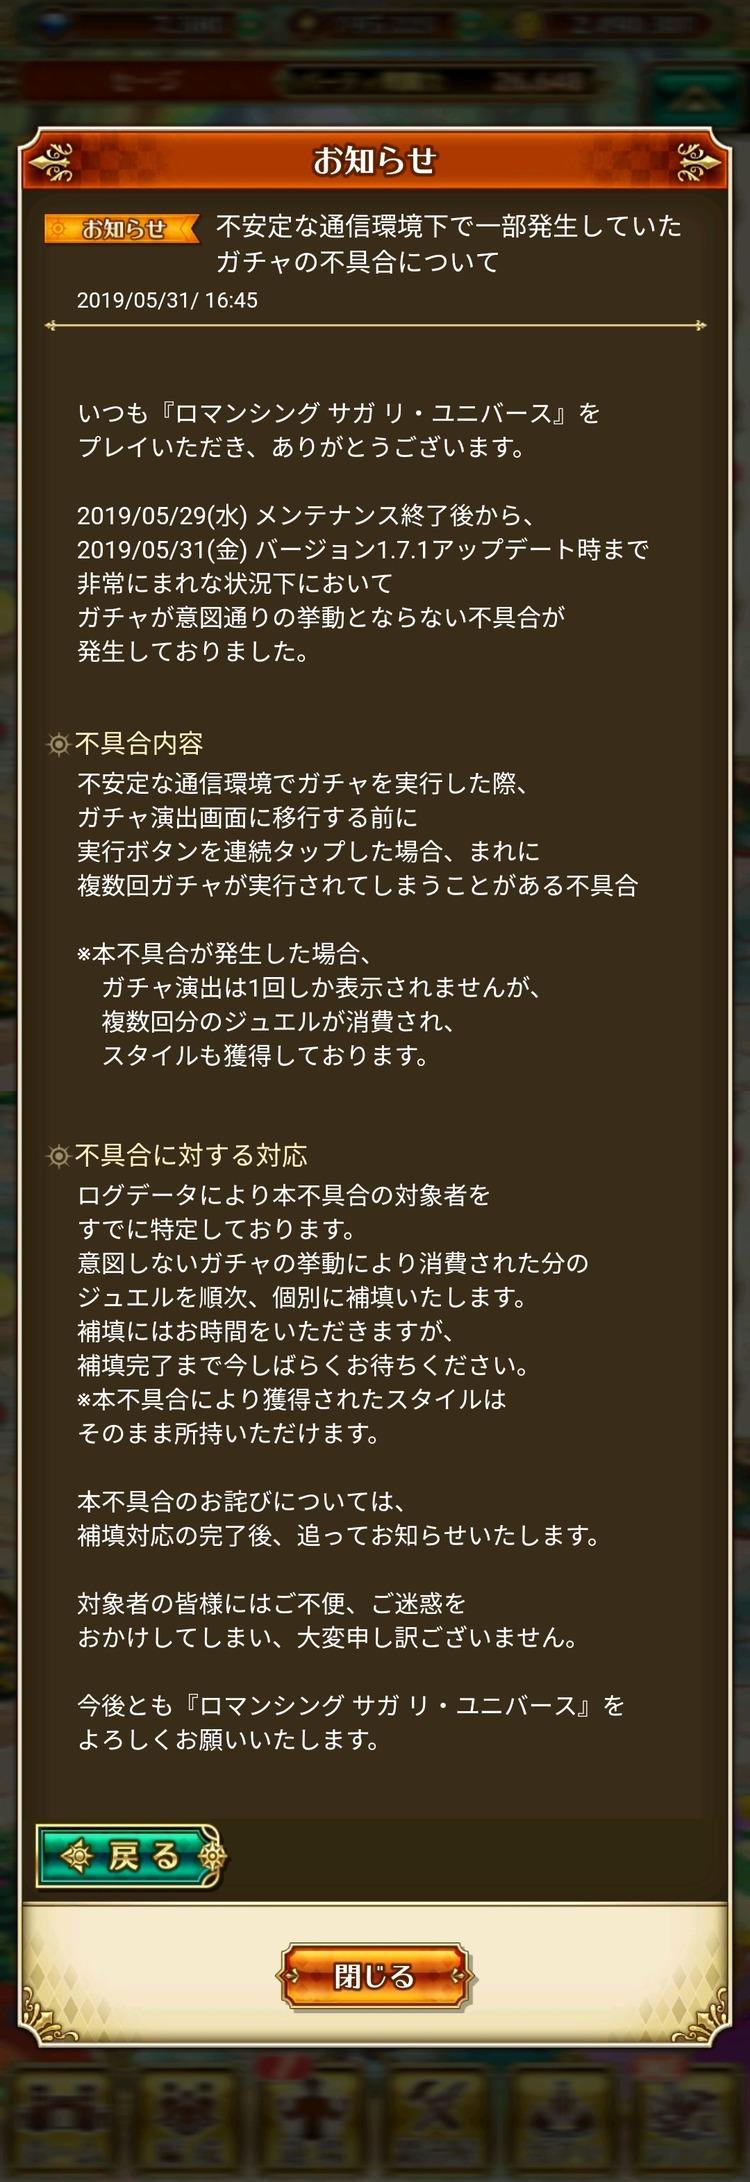 2019_05_31_17.43.54